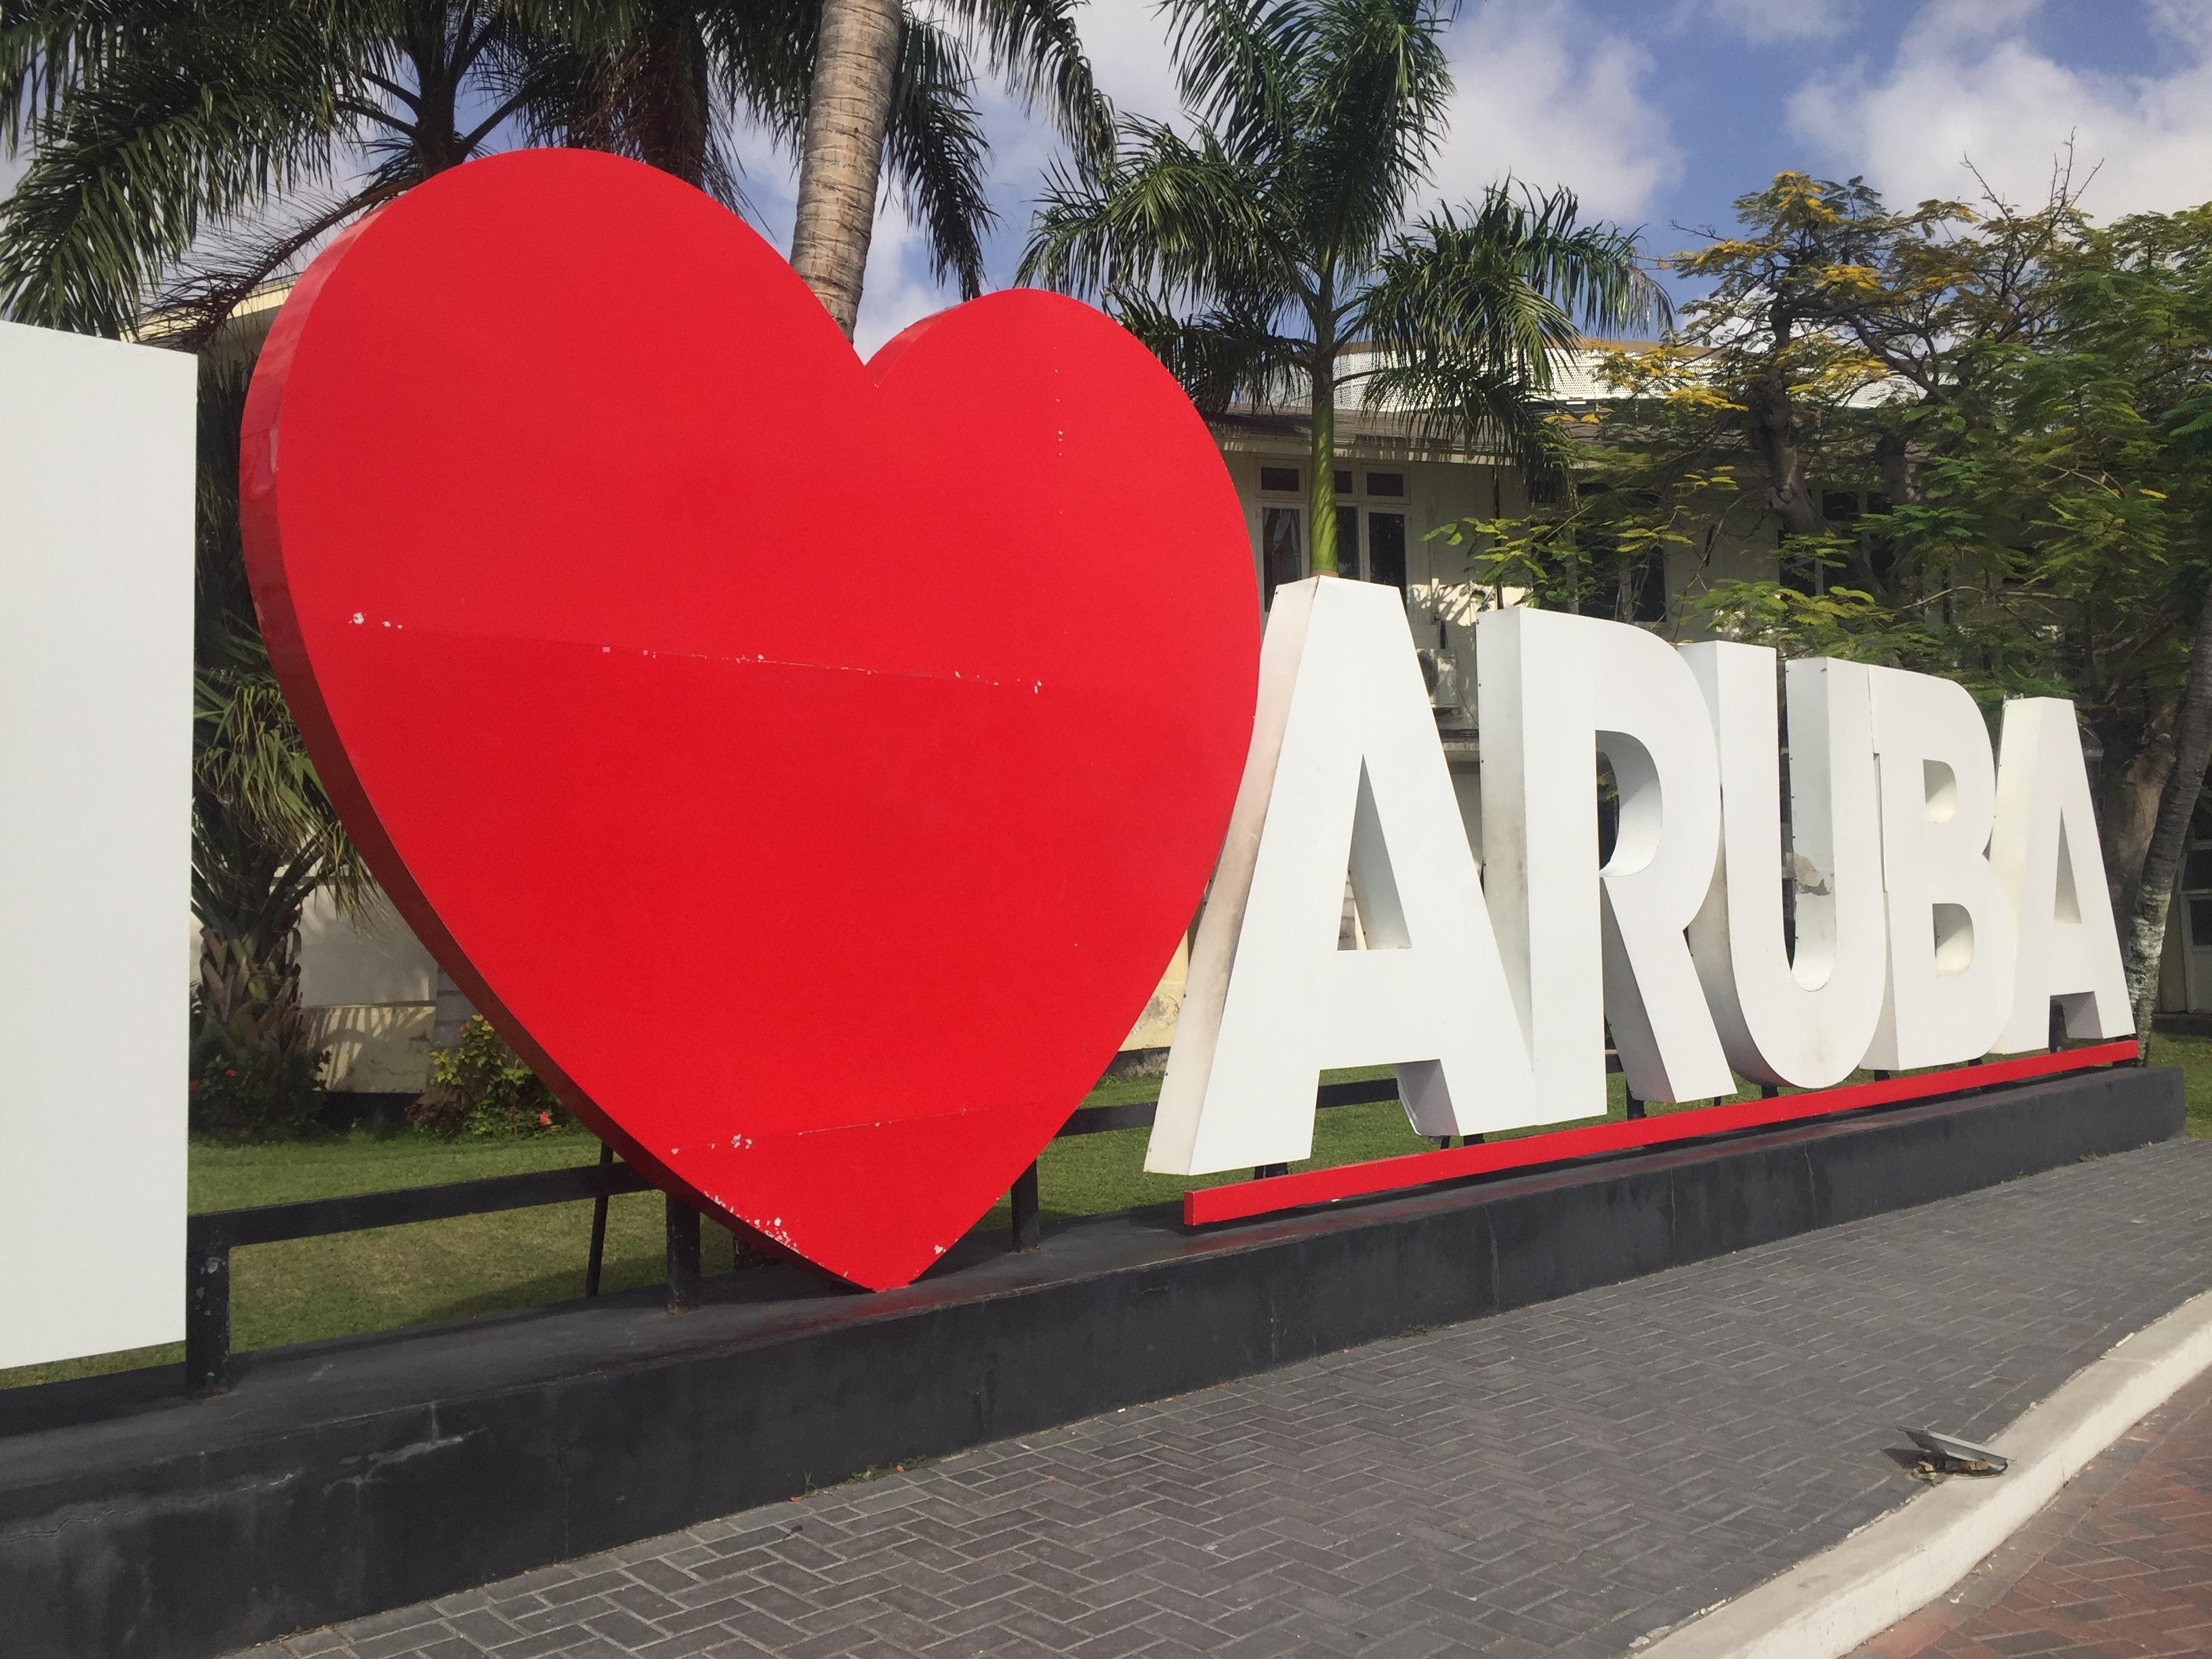 aruba love